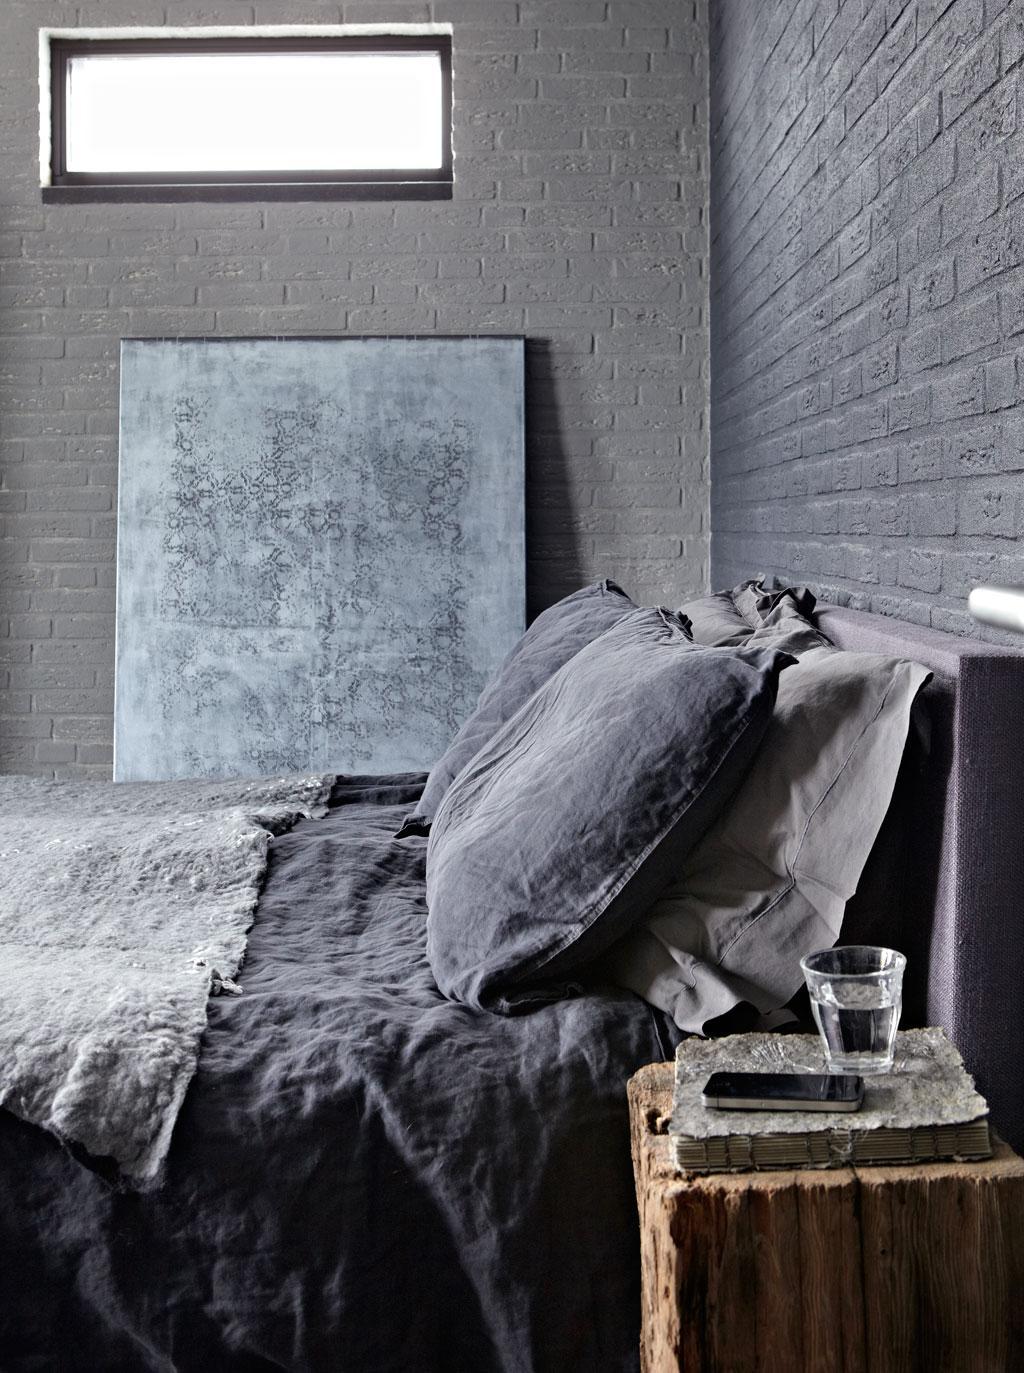 donkergrijze slaapkamer